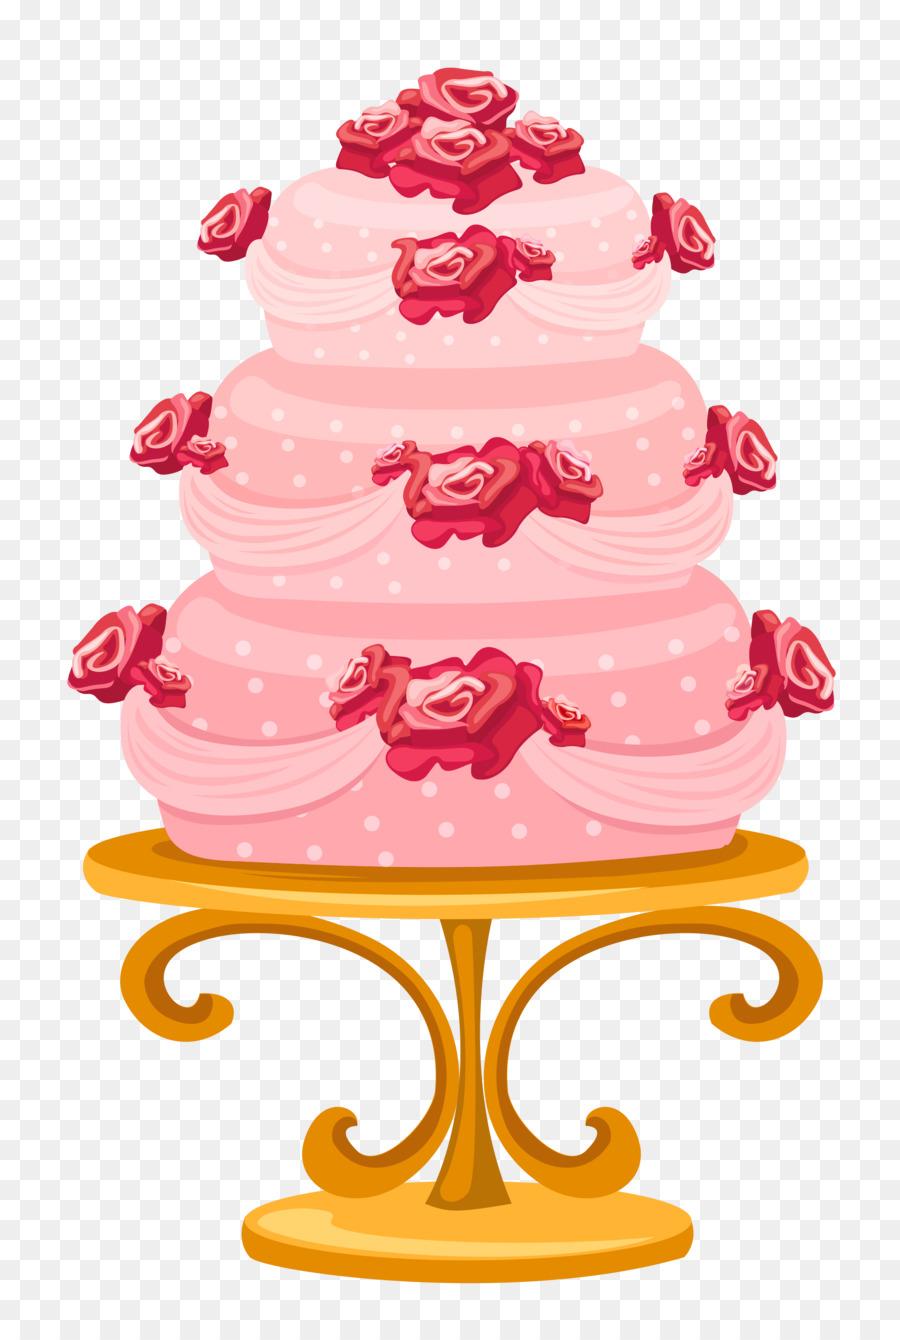 Birthday cake Wedding cake Cupcake Layer cake Chocolate cake ...